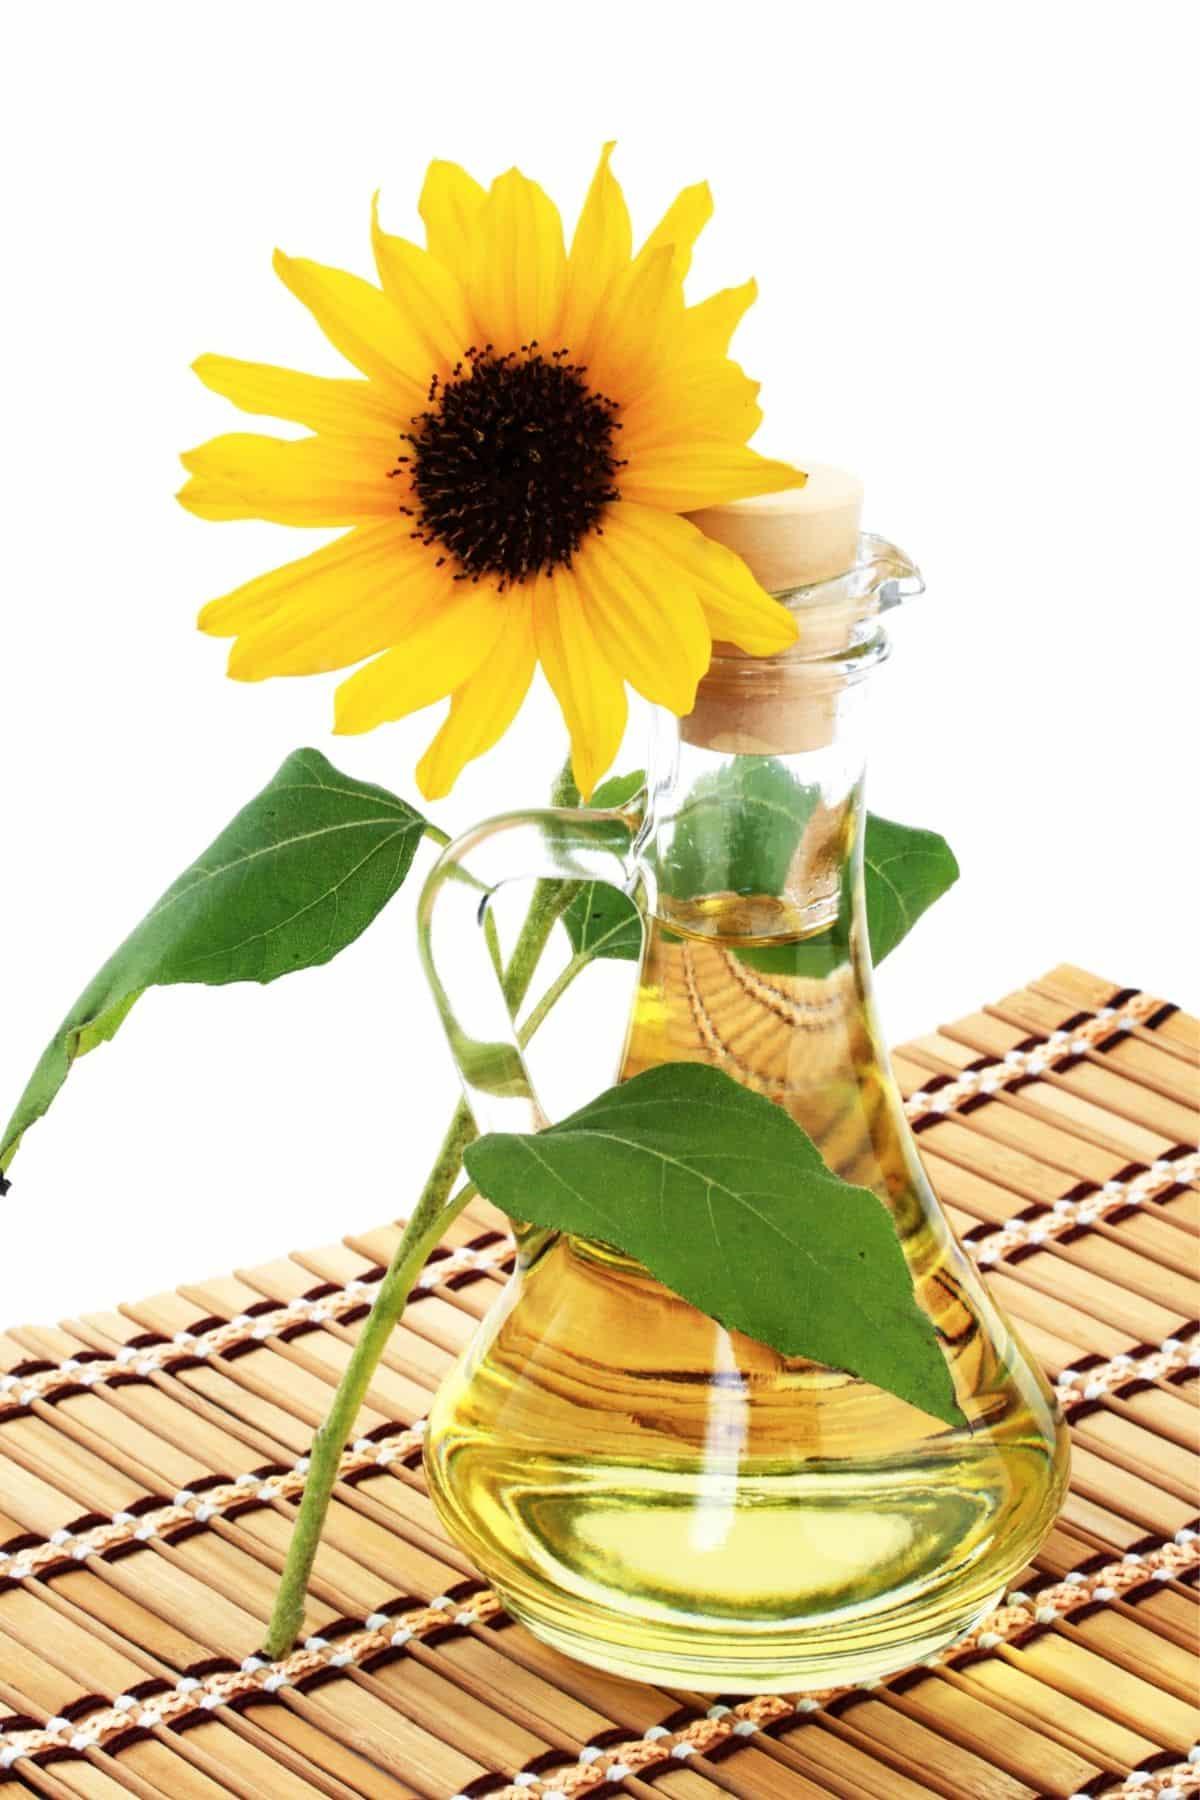 jar of sunflower oil with a fresh sunflower